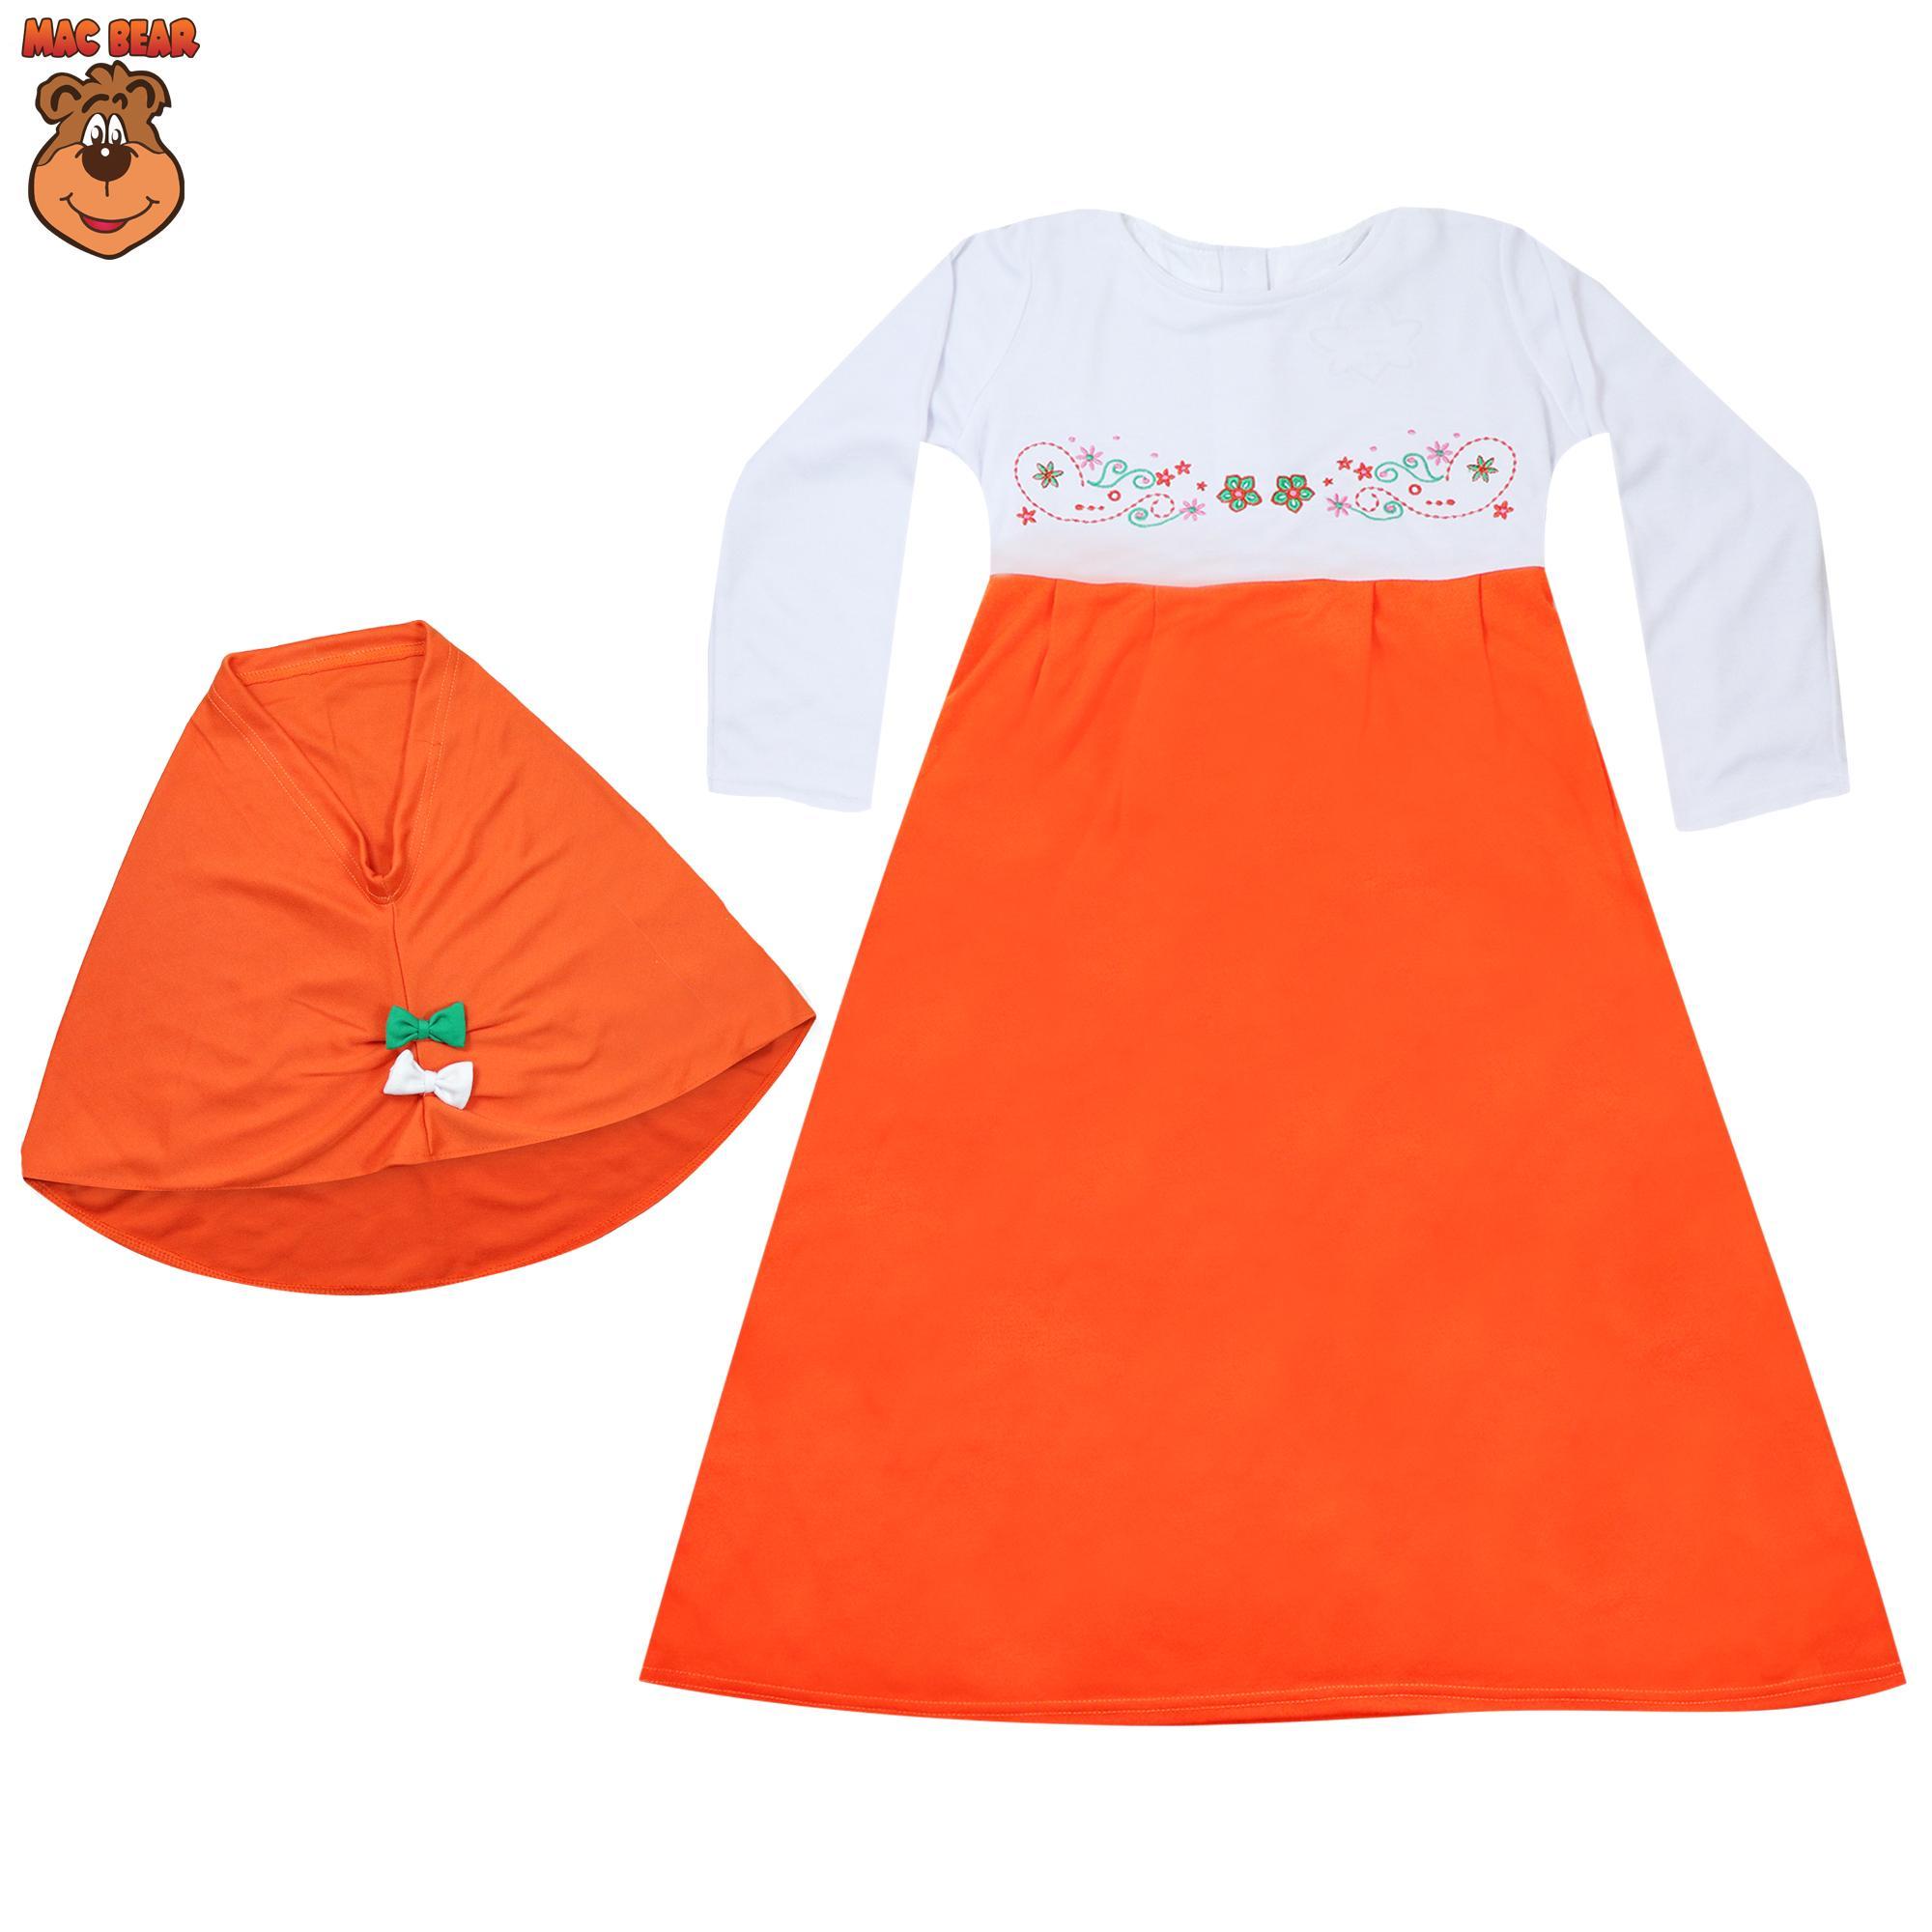 MacBee Kids Baju Anak Gamis Shakila Muslimah